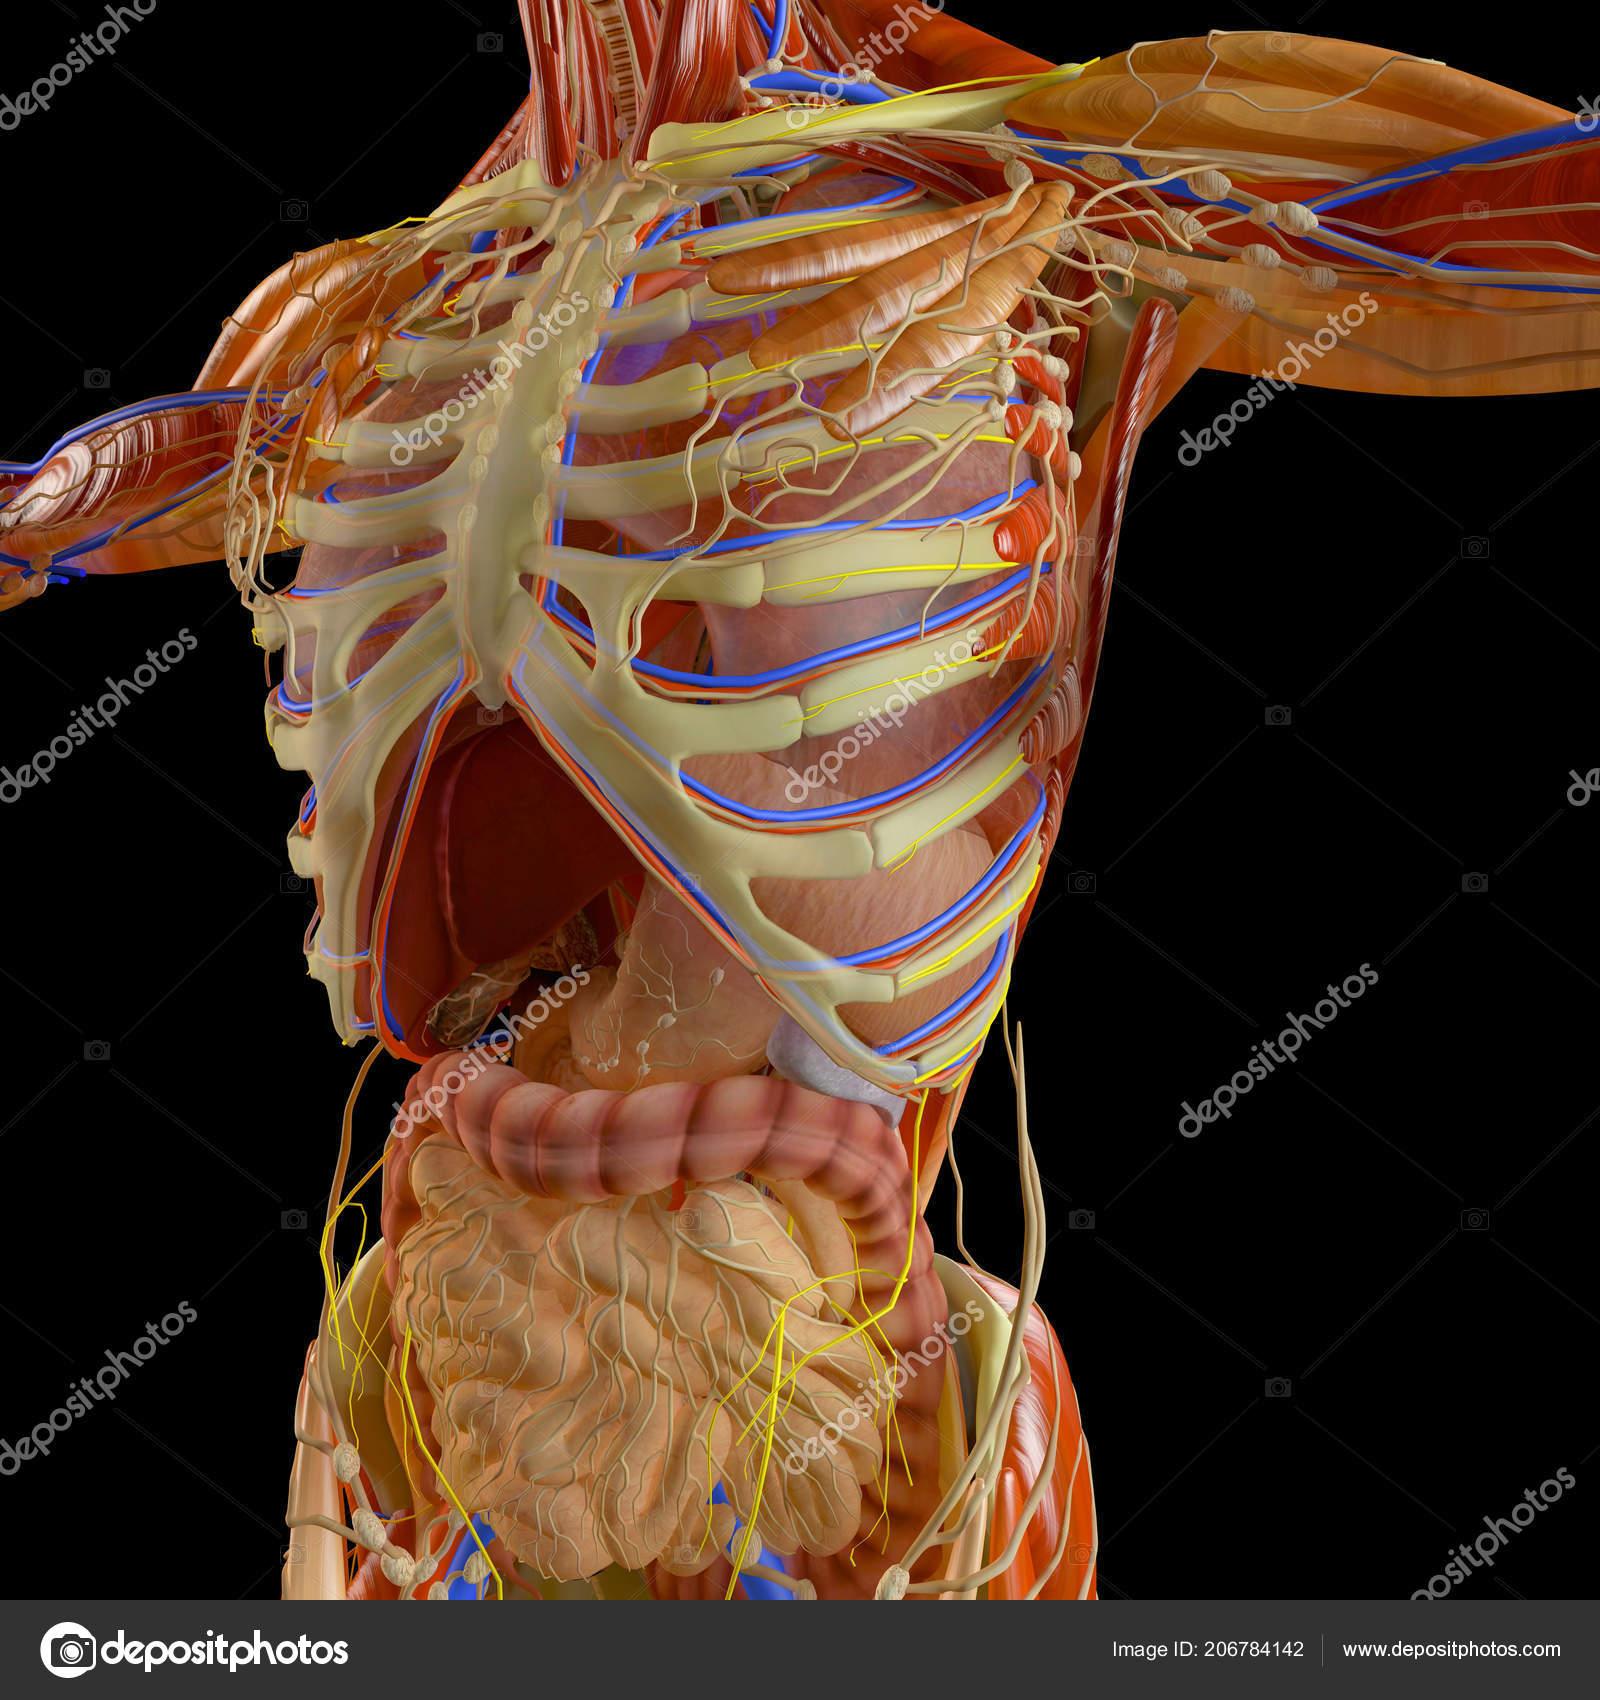 Human Body Man Digestive System Anatomy Intestine Enlargement